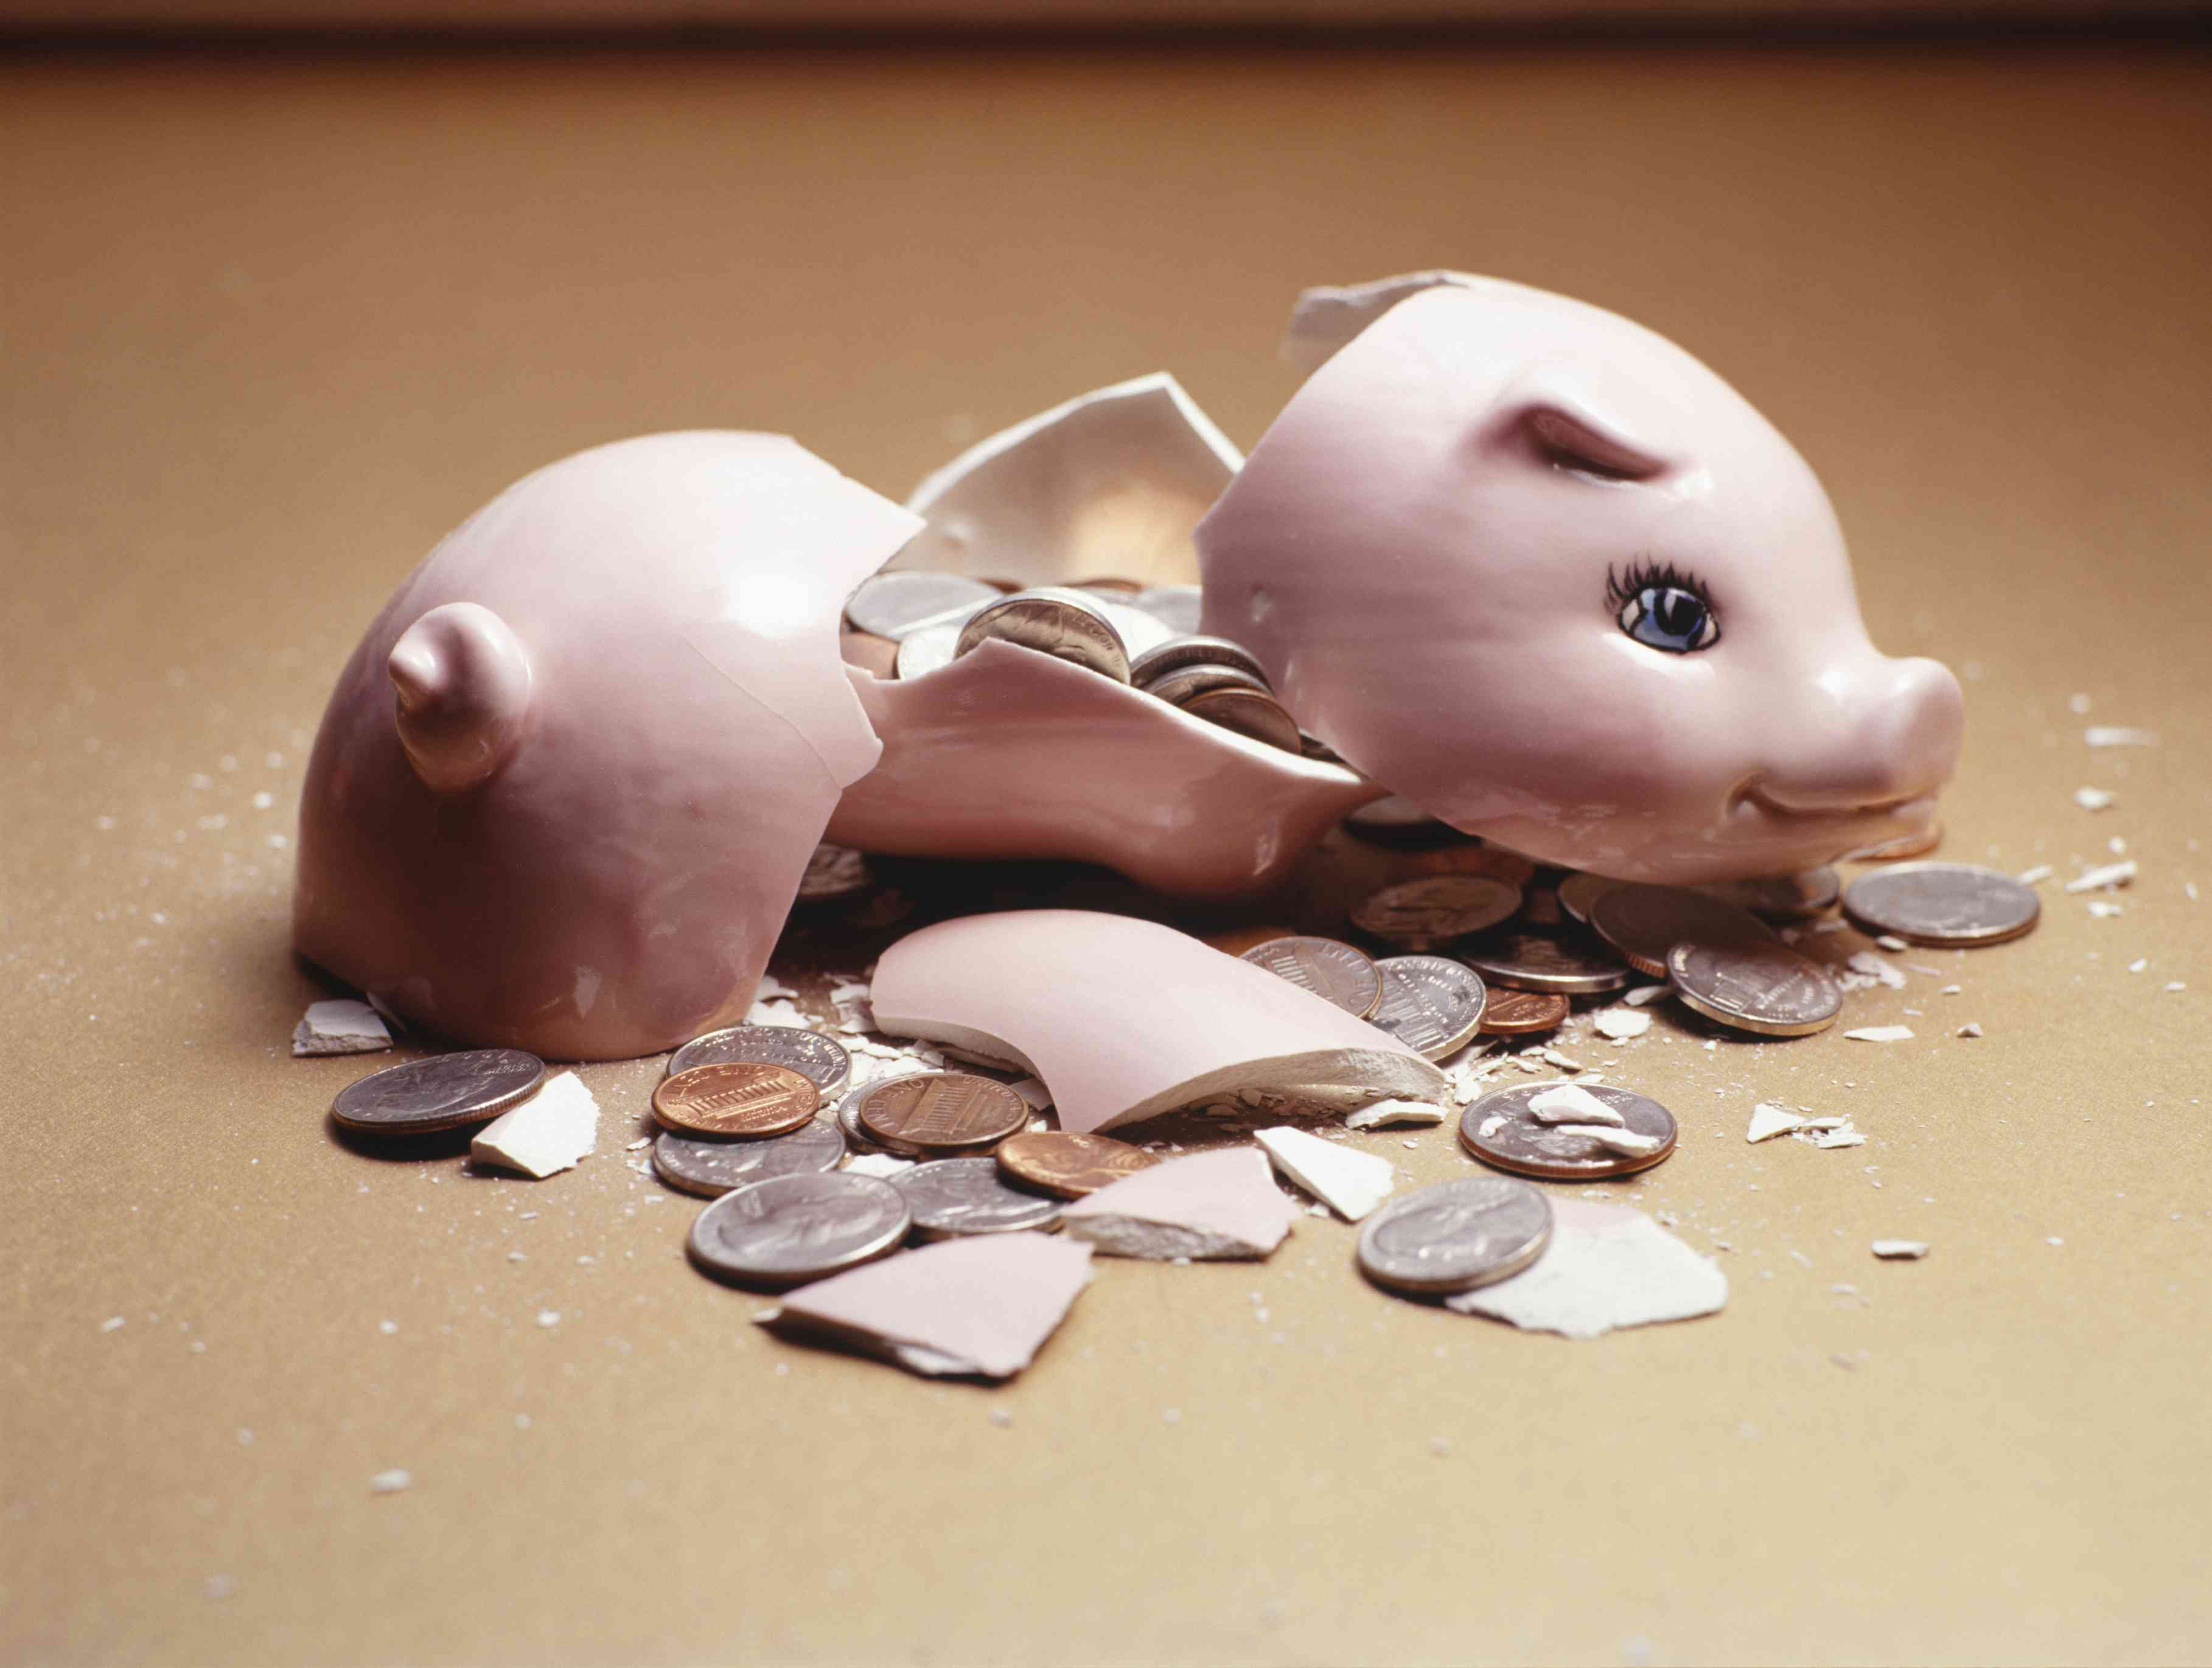 Defie vesting investment management basics training